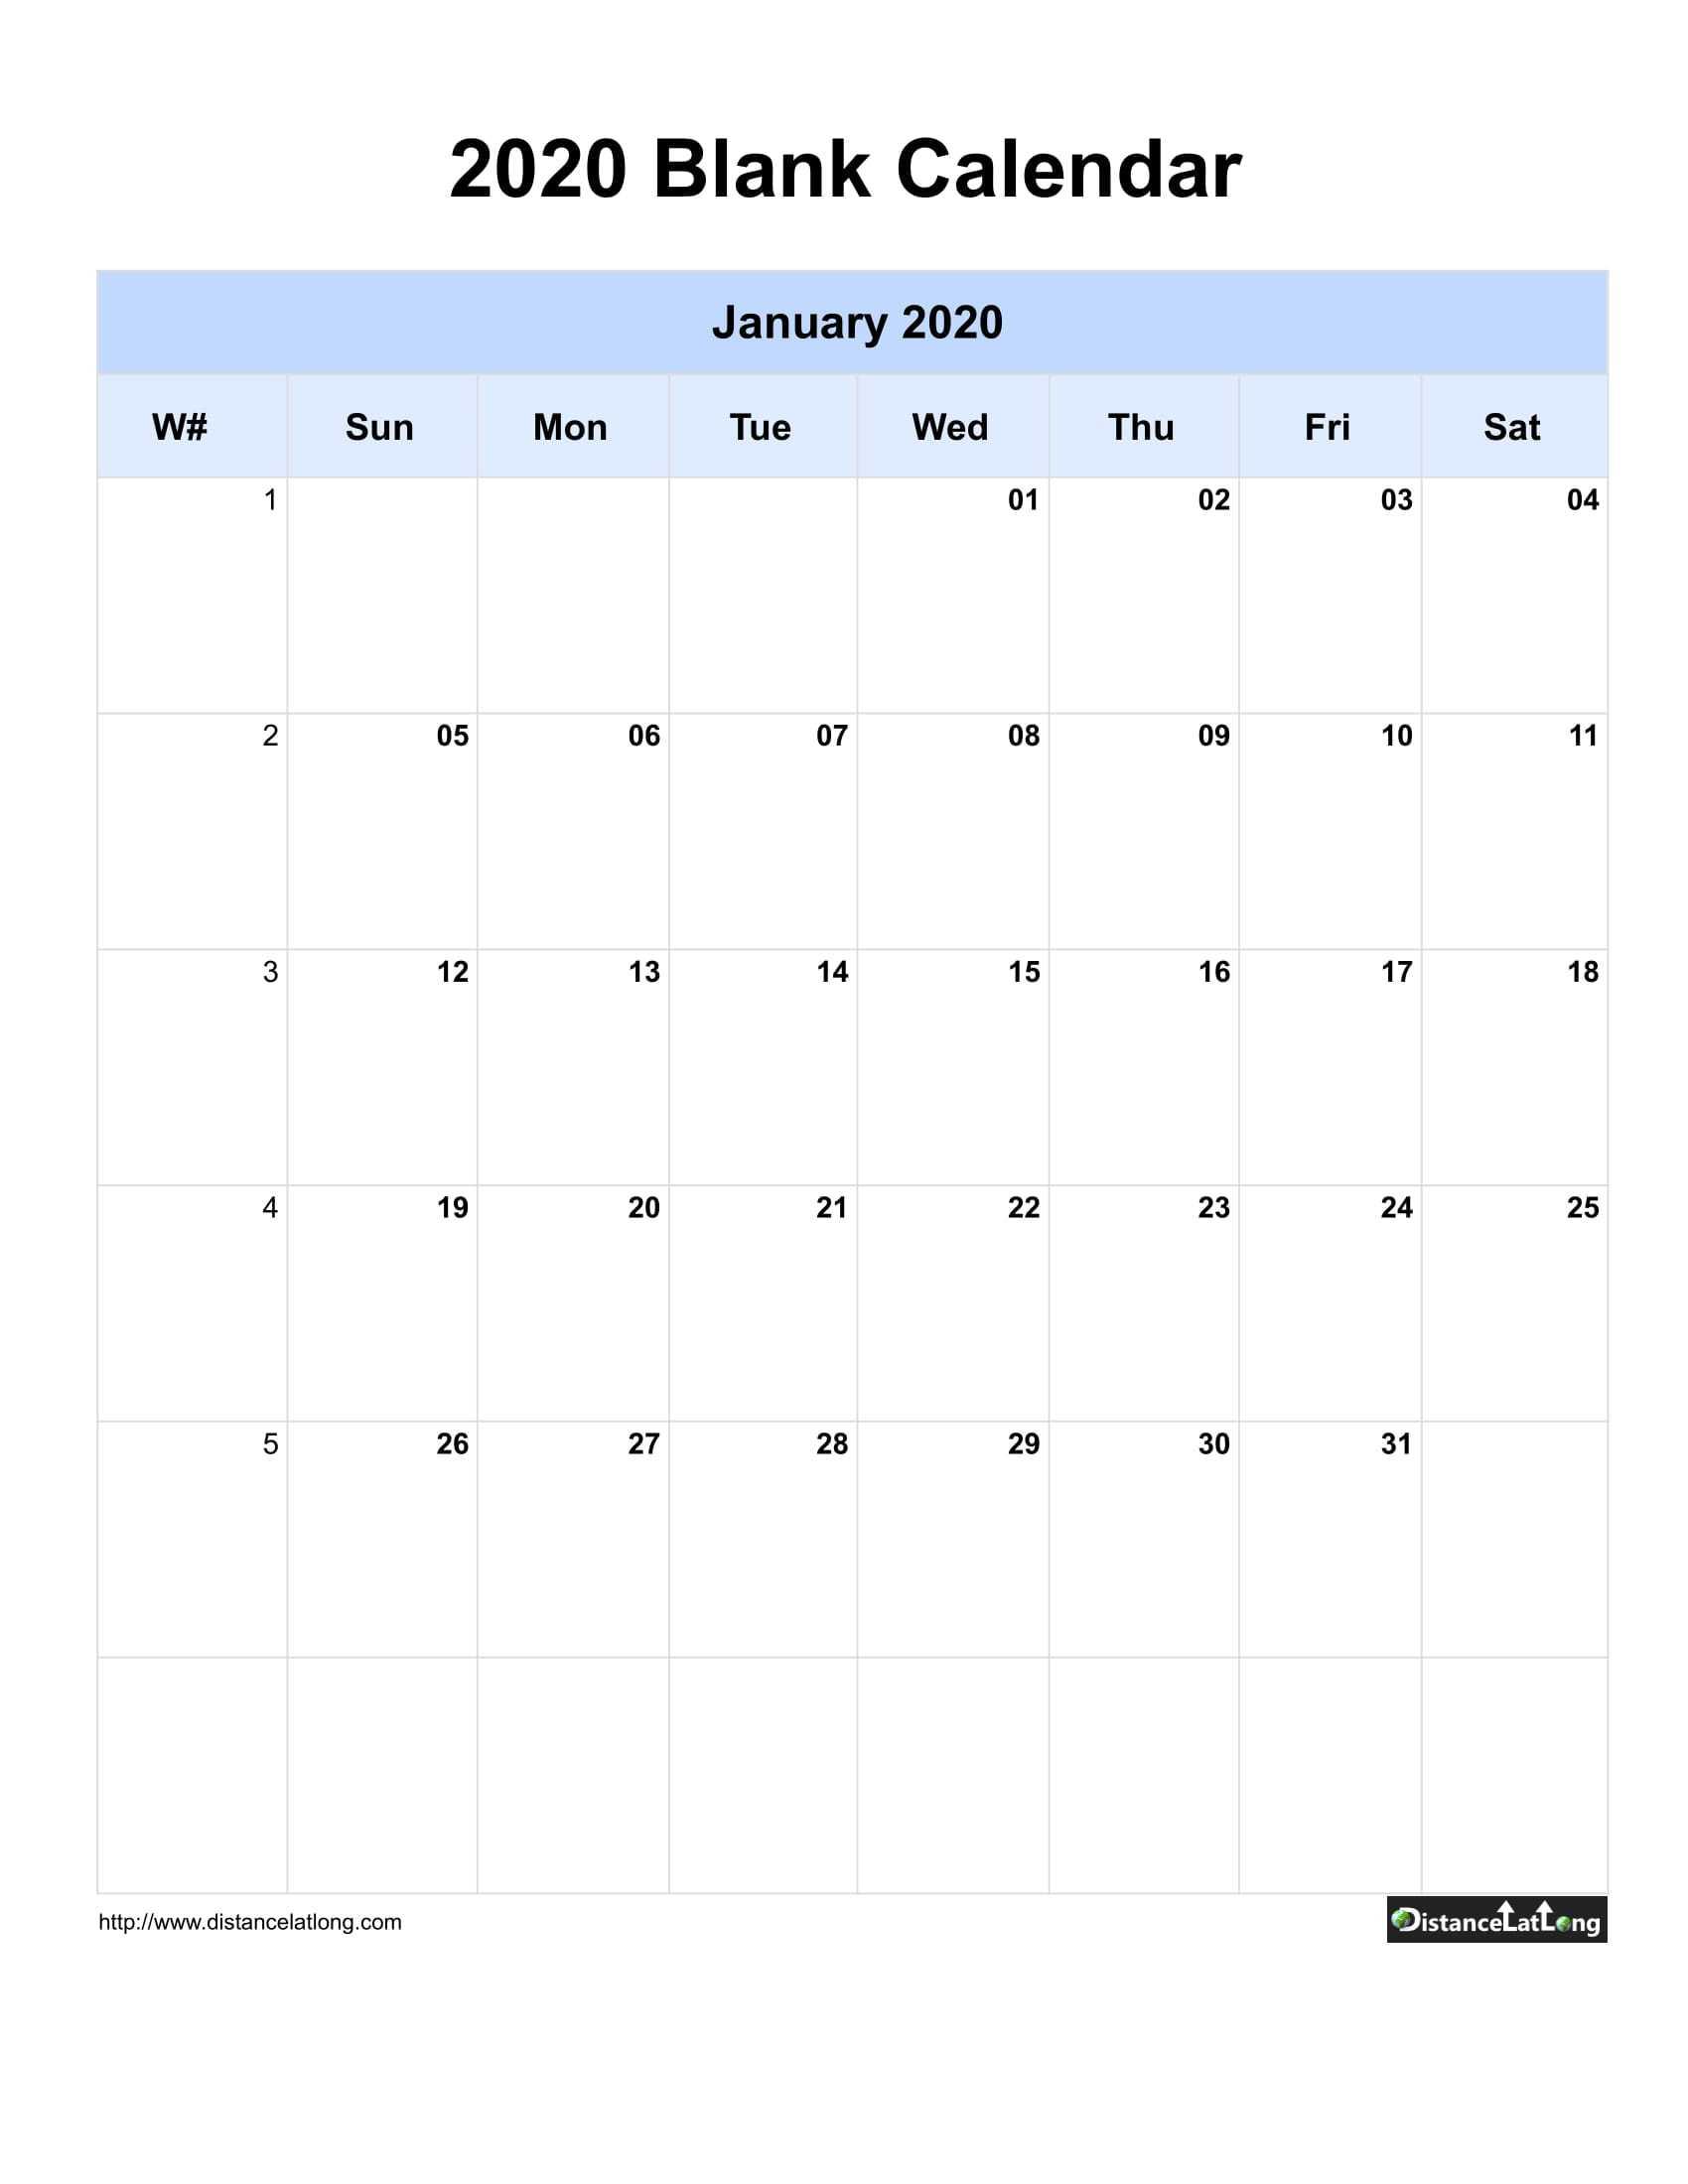 2020 Blank Calendar Blank Portrait Orientation Free For Blank One Month Calendar Template